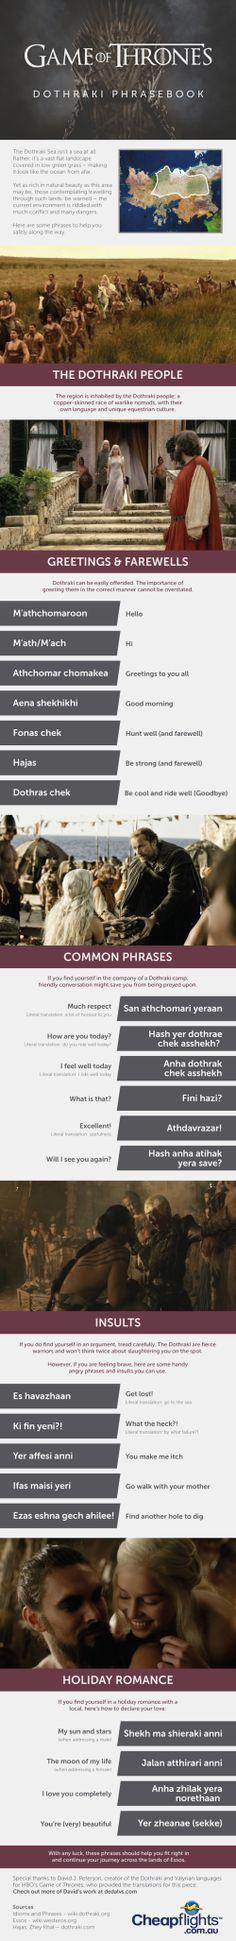 got_dothraki